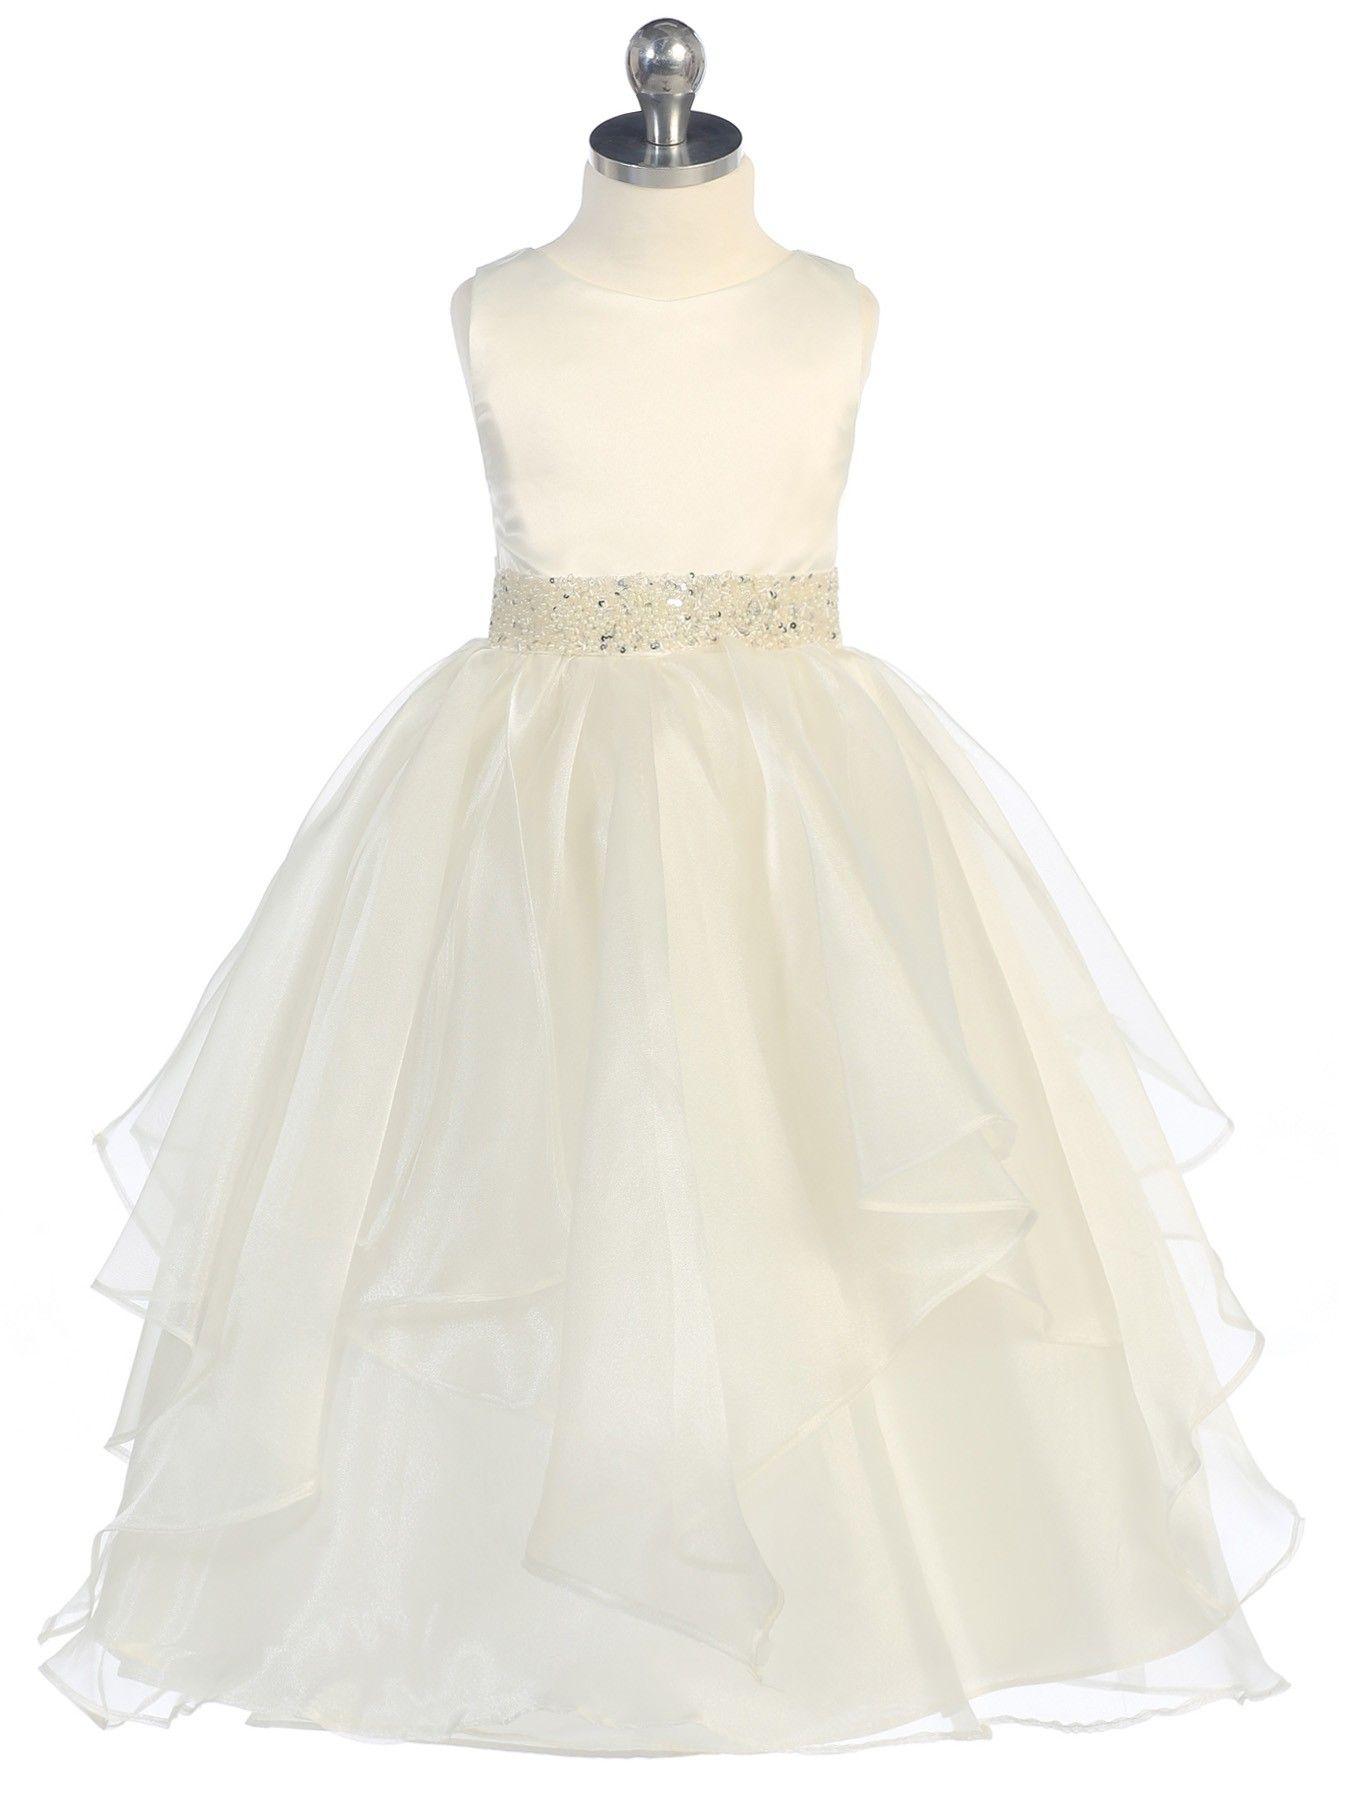 56bec9867bda Ivory Asymmetric Ruffles Satin Organza Flower Girl Dress (Sizes ...